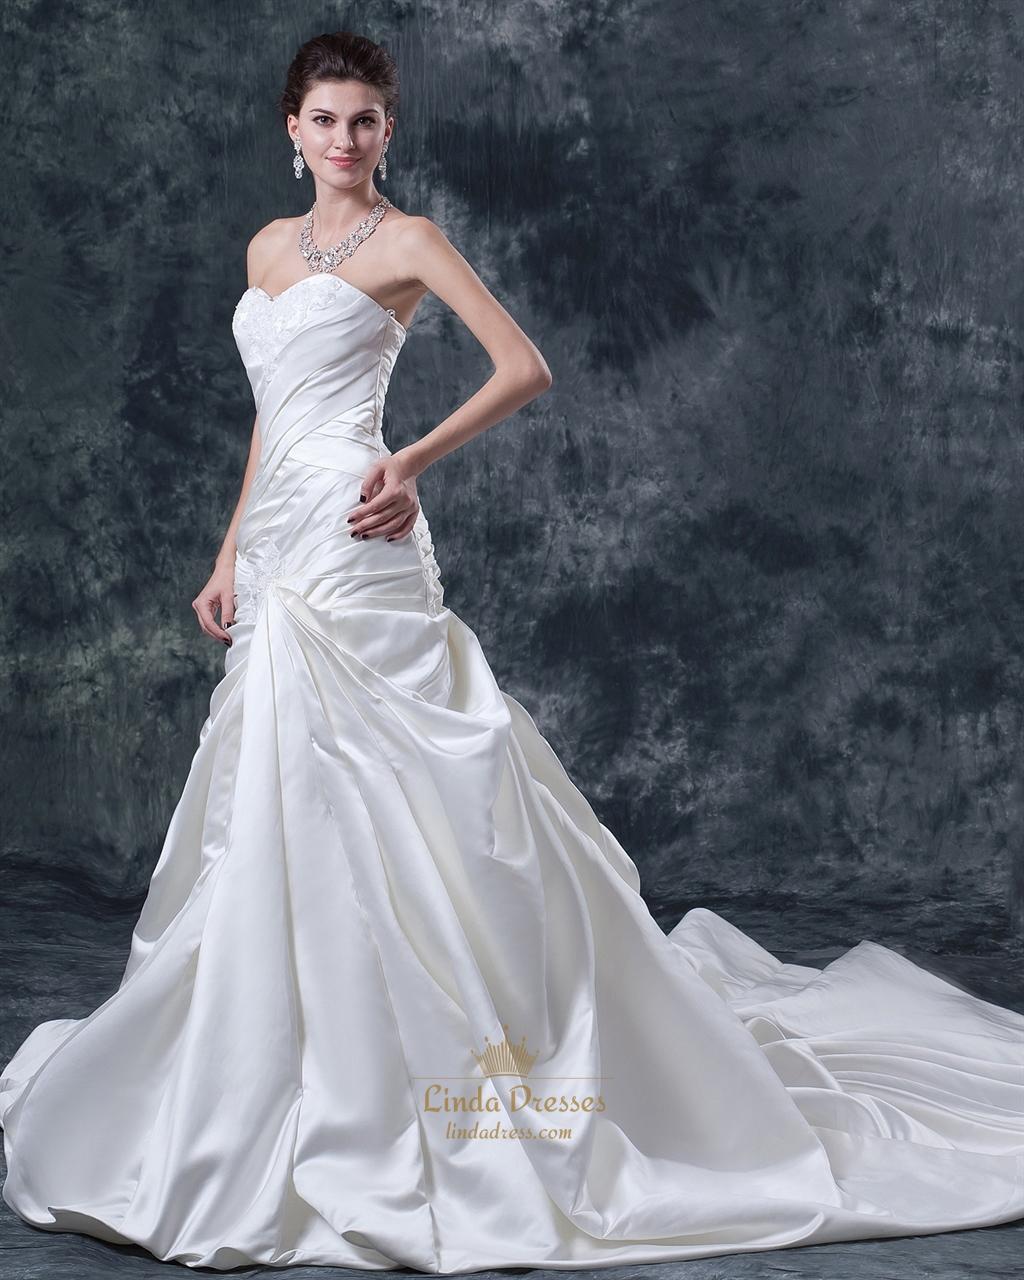 Mermaid Train: Ivory Strapless Mermaid Sweep Train Wedding Dresses With